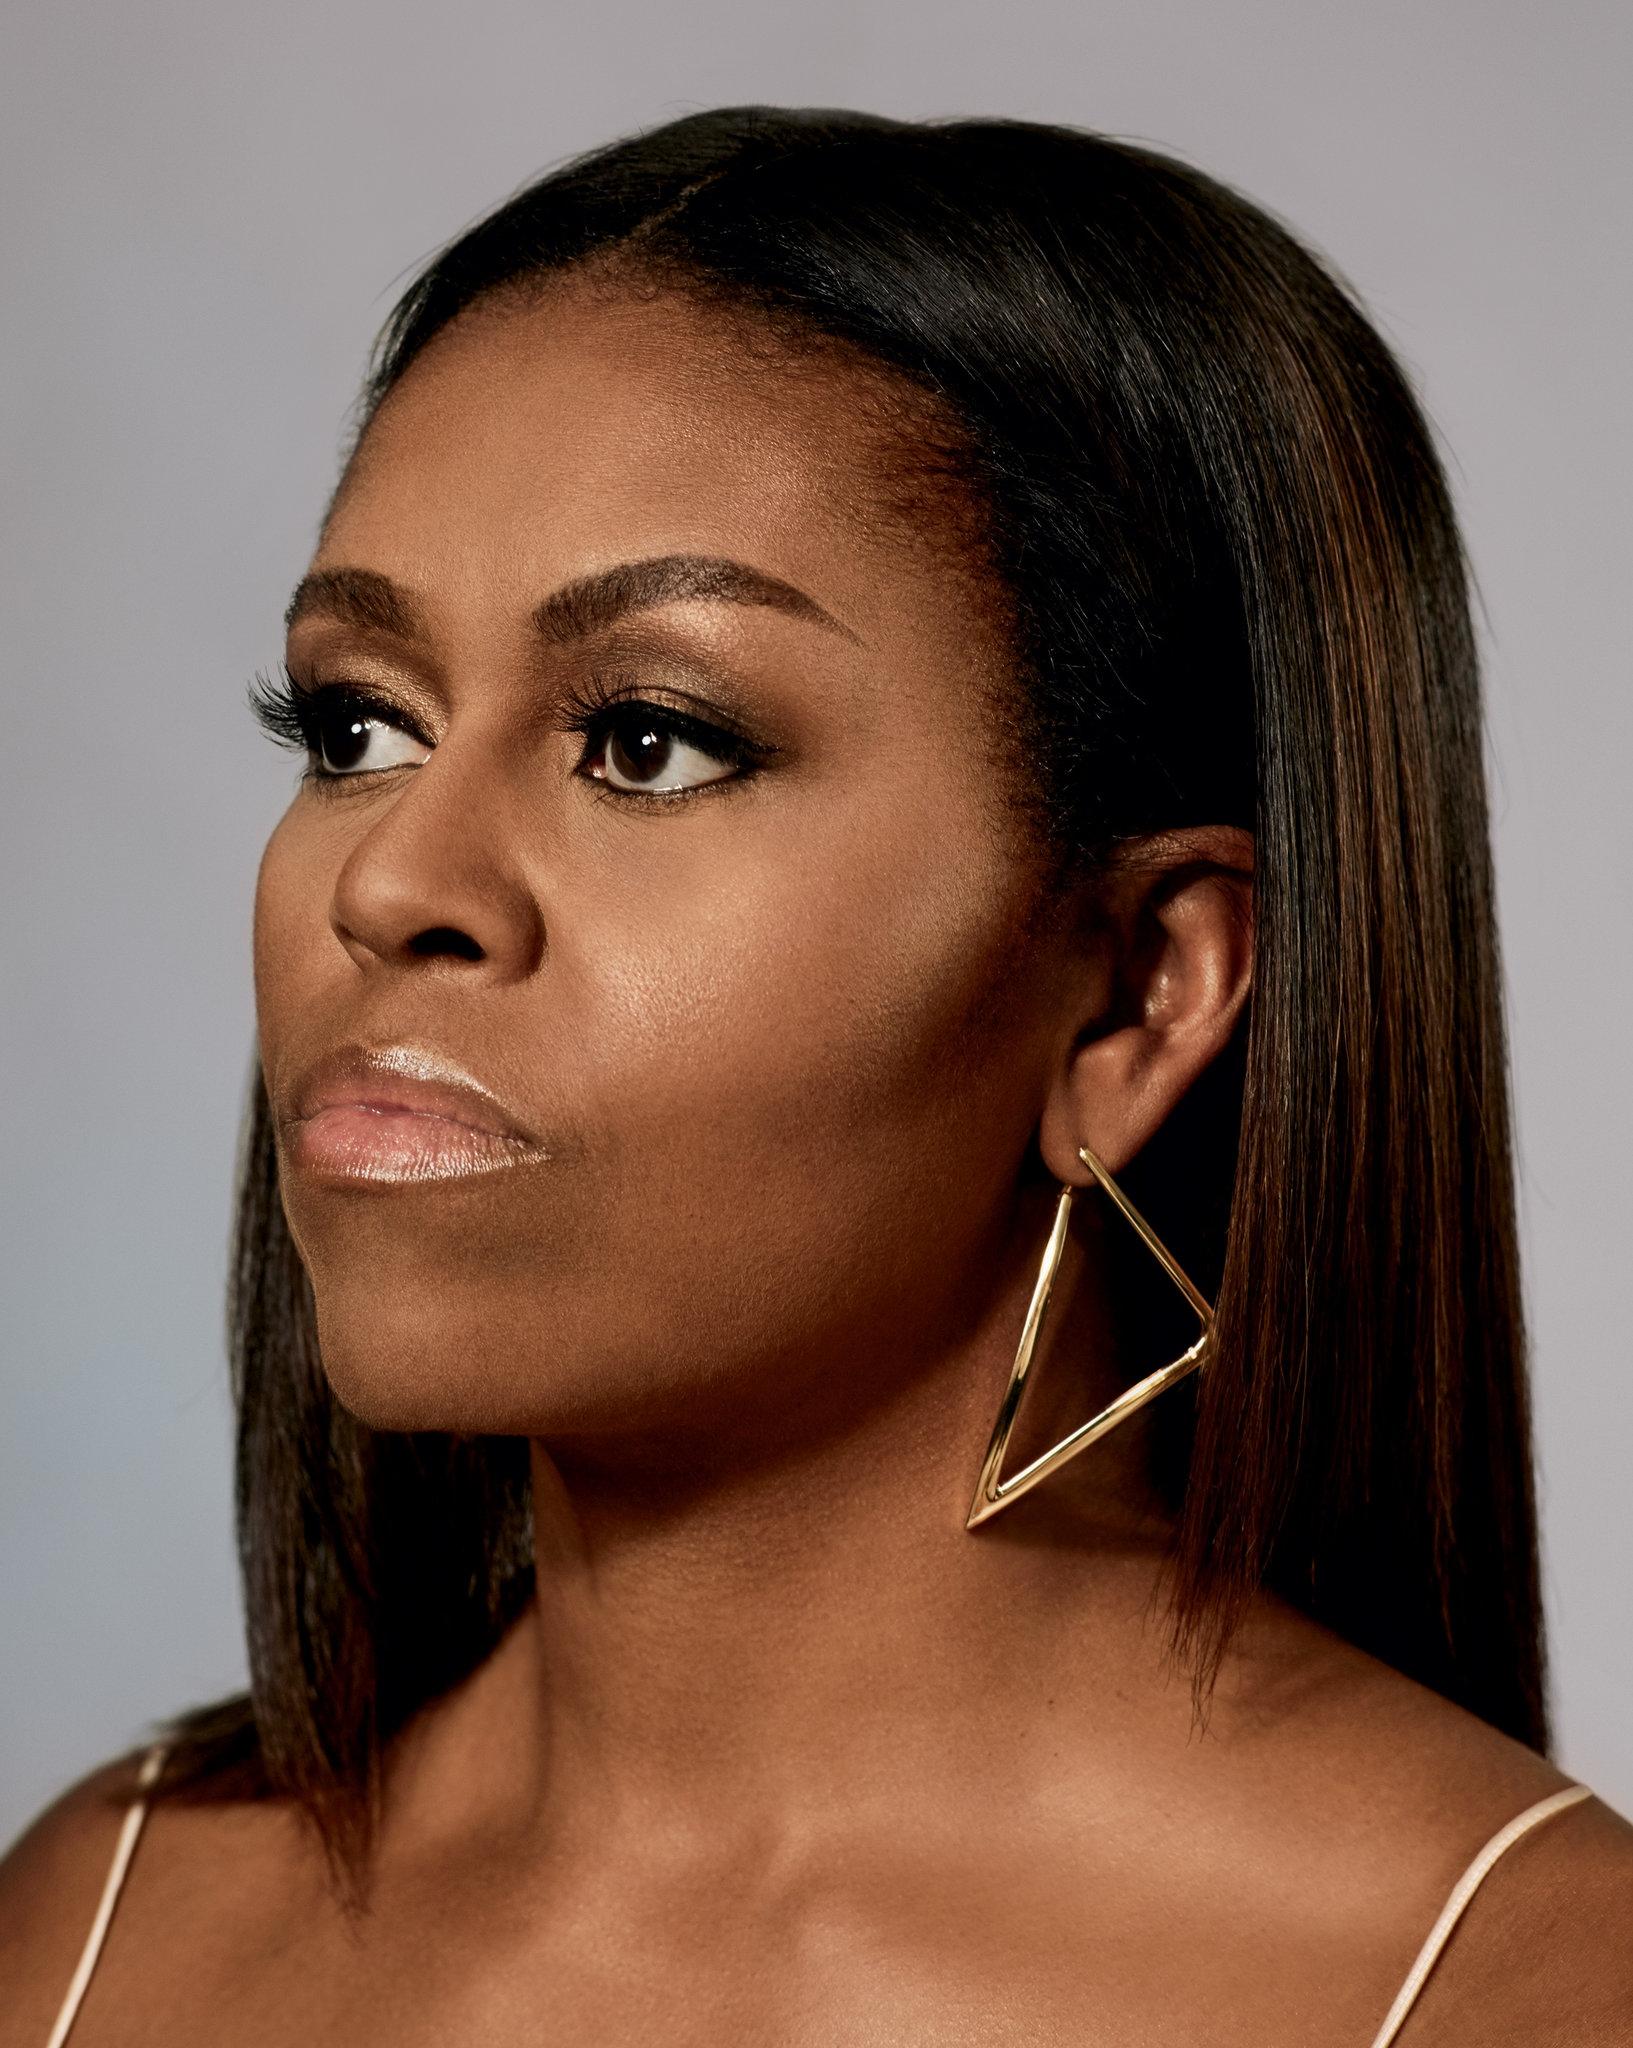 michelle-obama-New-York-Times-October-2016-BellaNaija-001